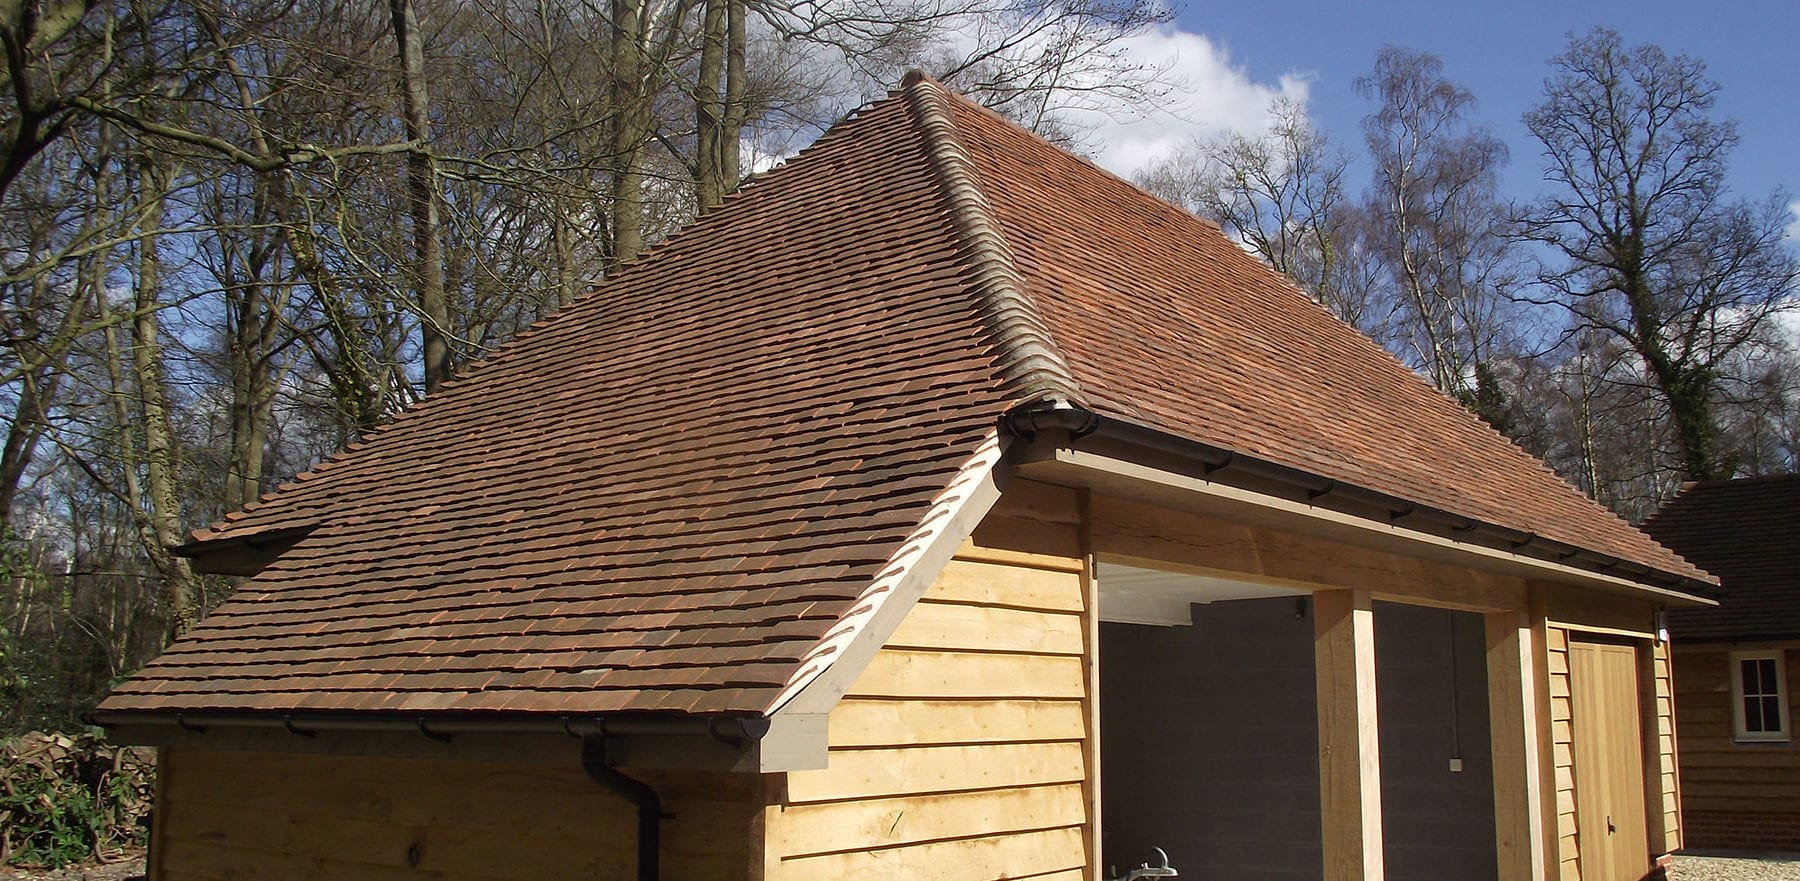 Lifestiles - Handmade Brown Clay Roof Tiles - Romsey, England 7